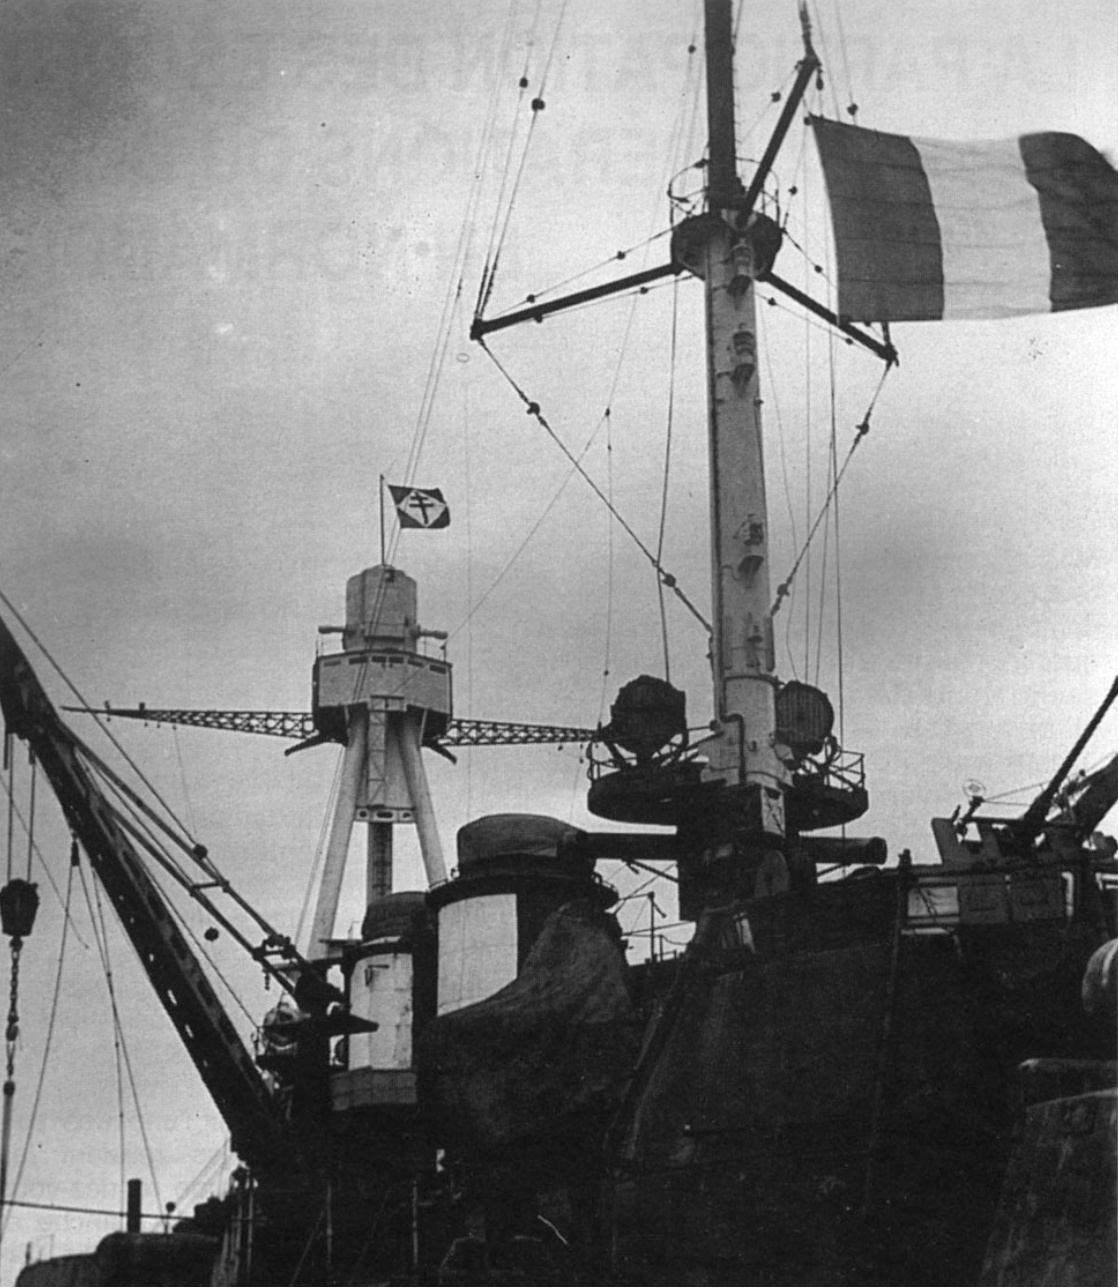 Le sabordage du Courbet, par l'amiral Maurice Giret